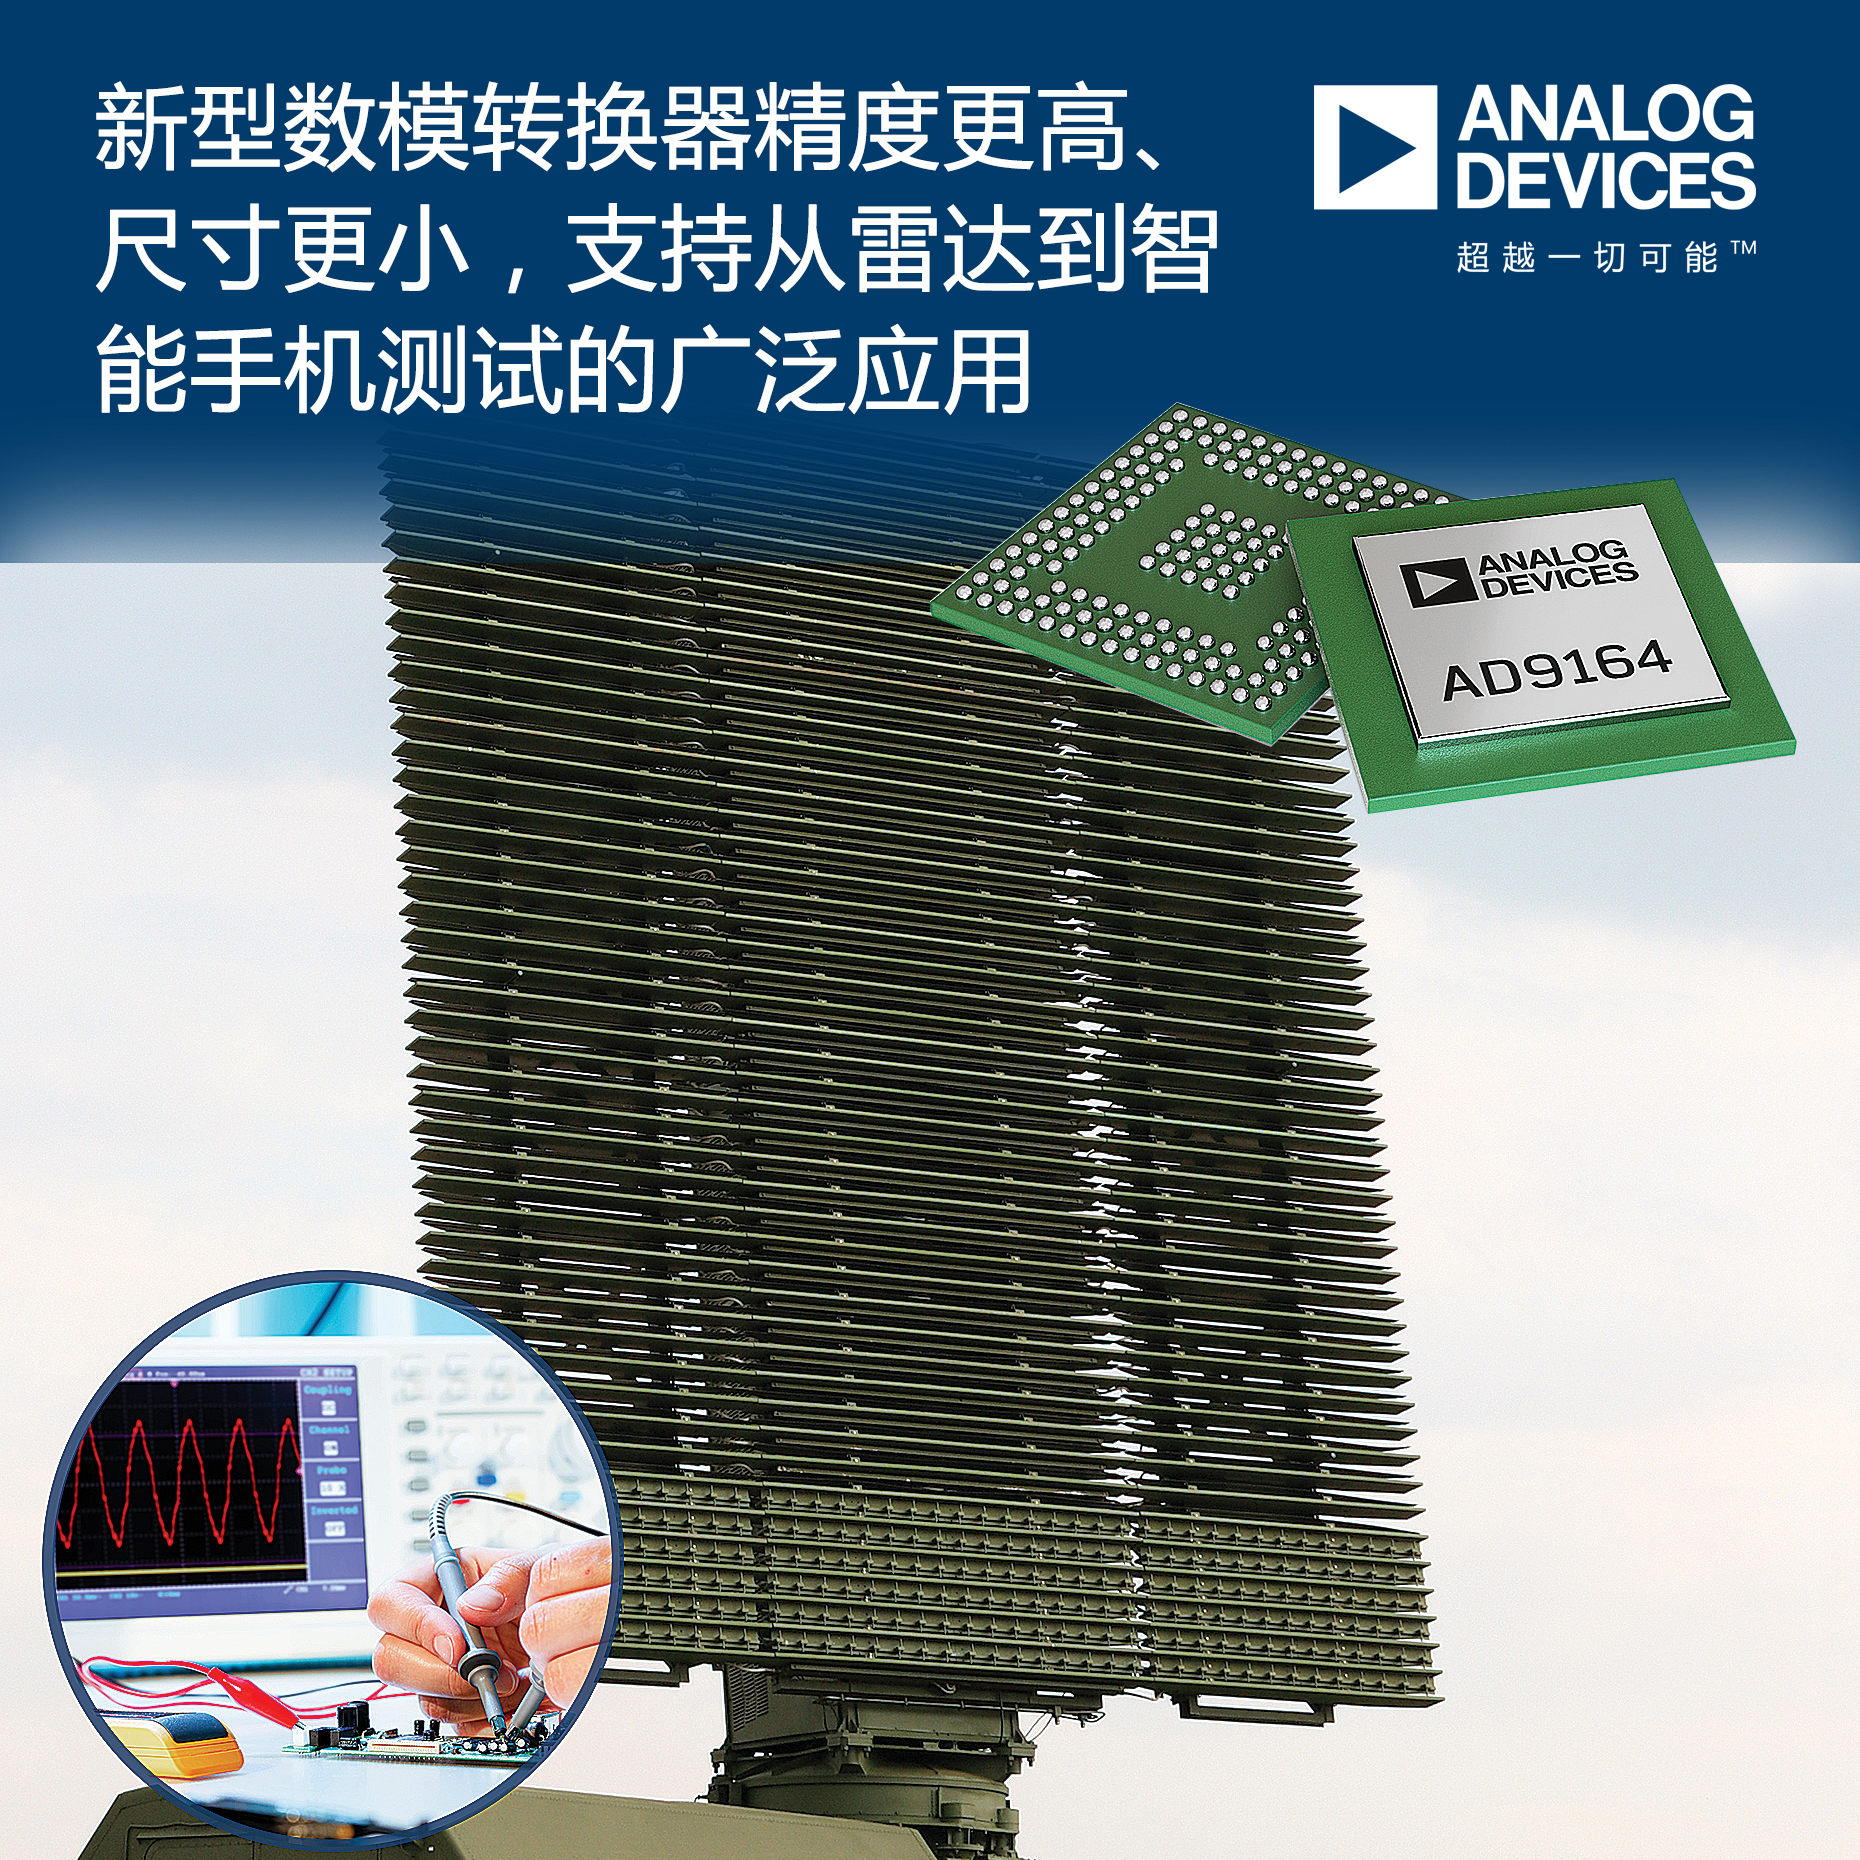 ADI推出高精度新型数模转换器AD9164